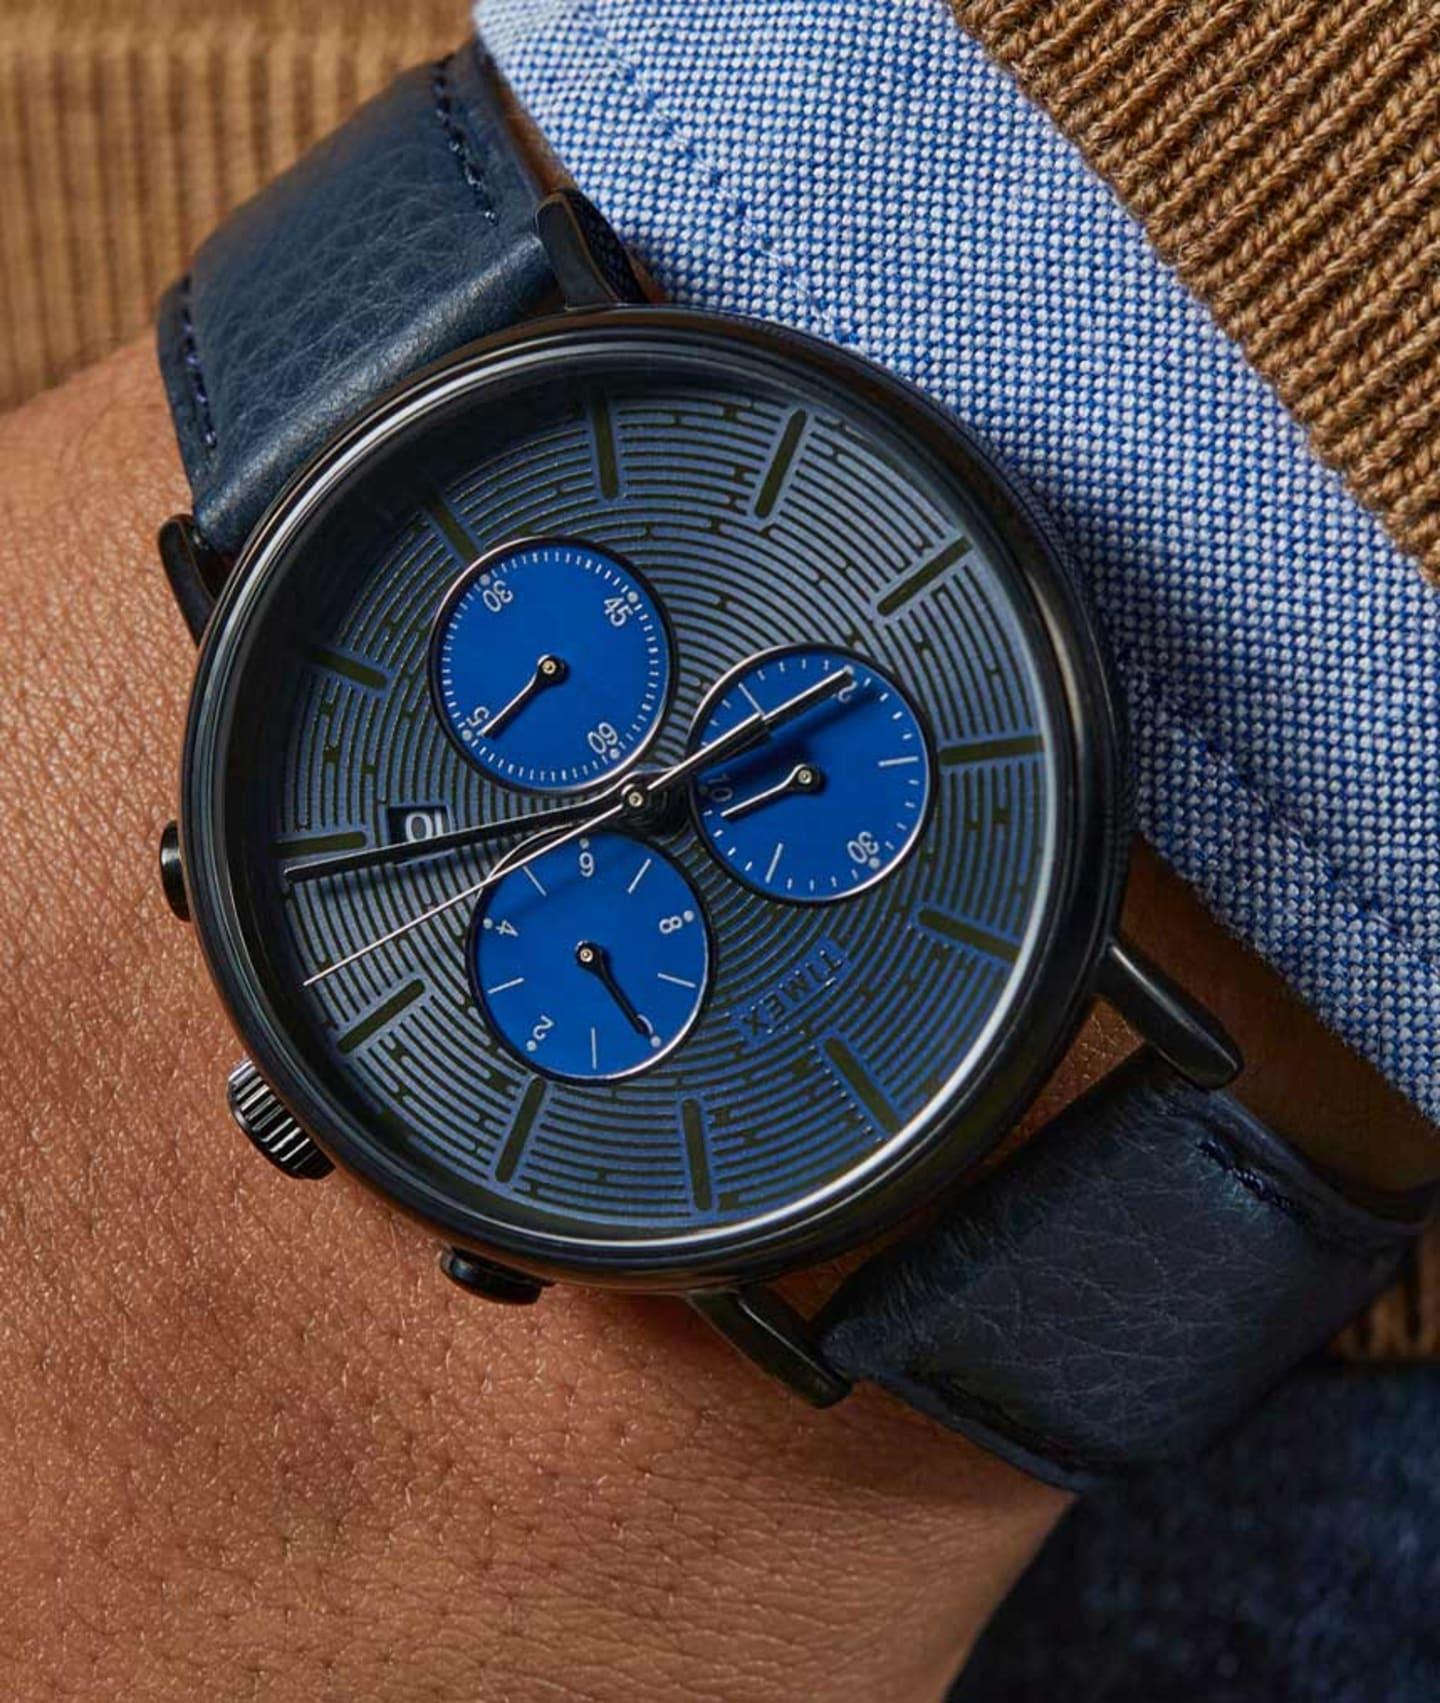 Fairfield Chronograph Watch.